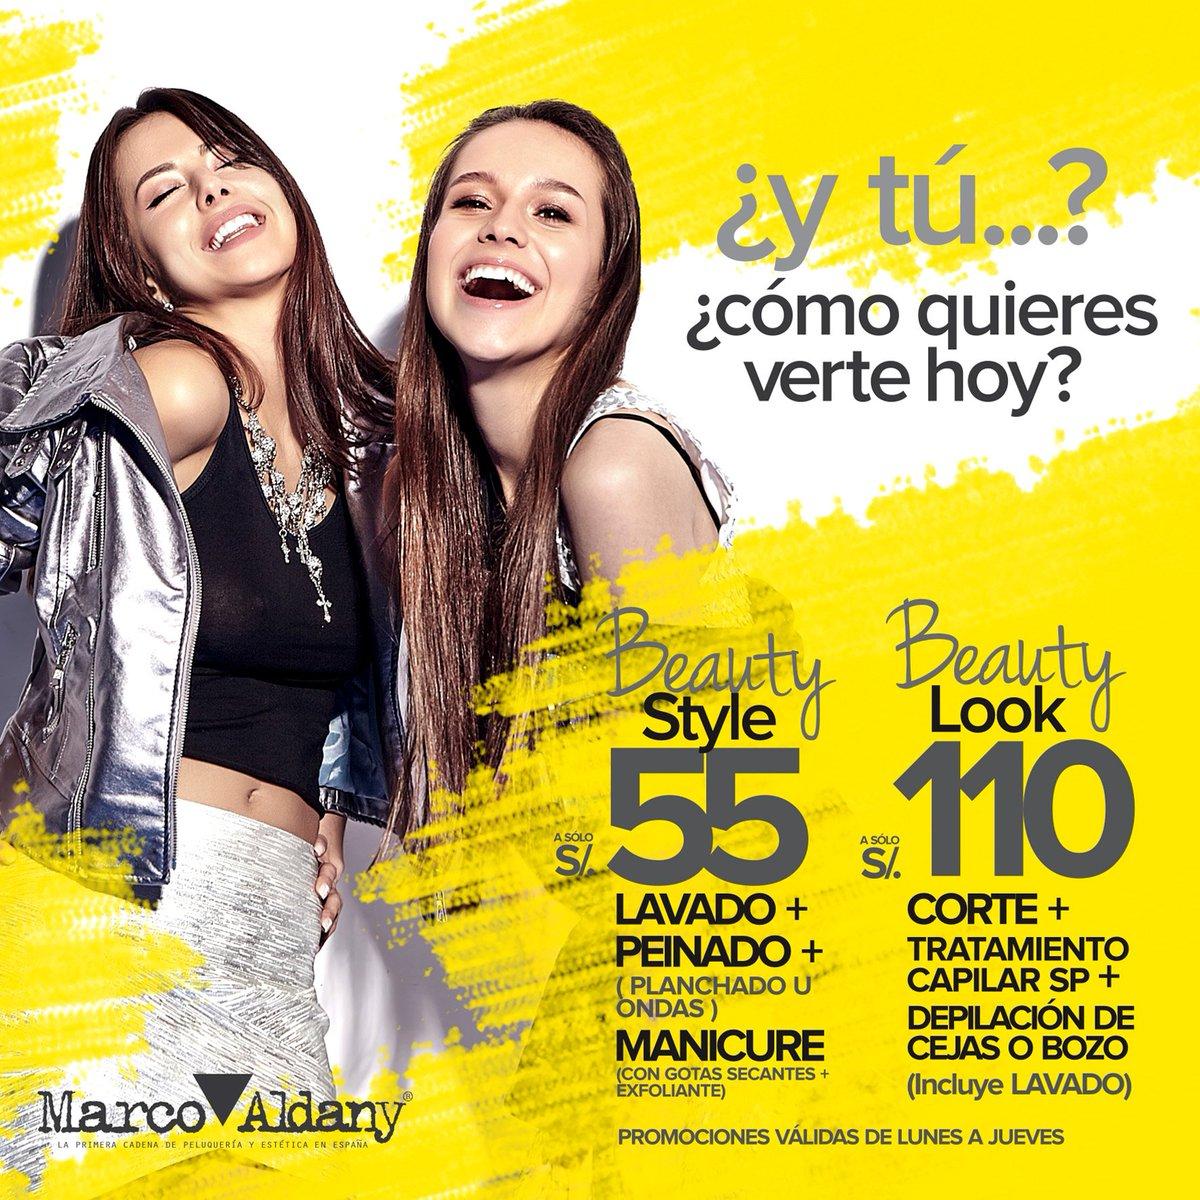 Marco Aldany Perú (@MarcoAldanyPeru) | Twitter